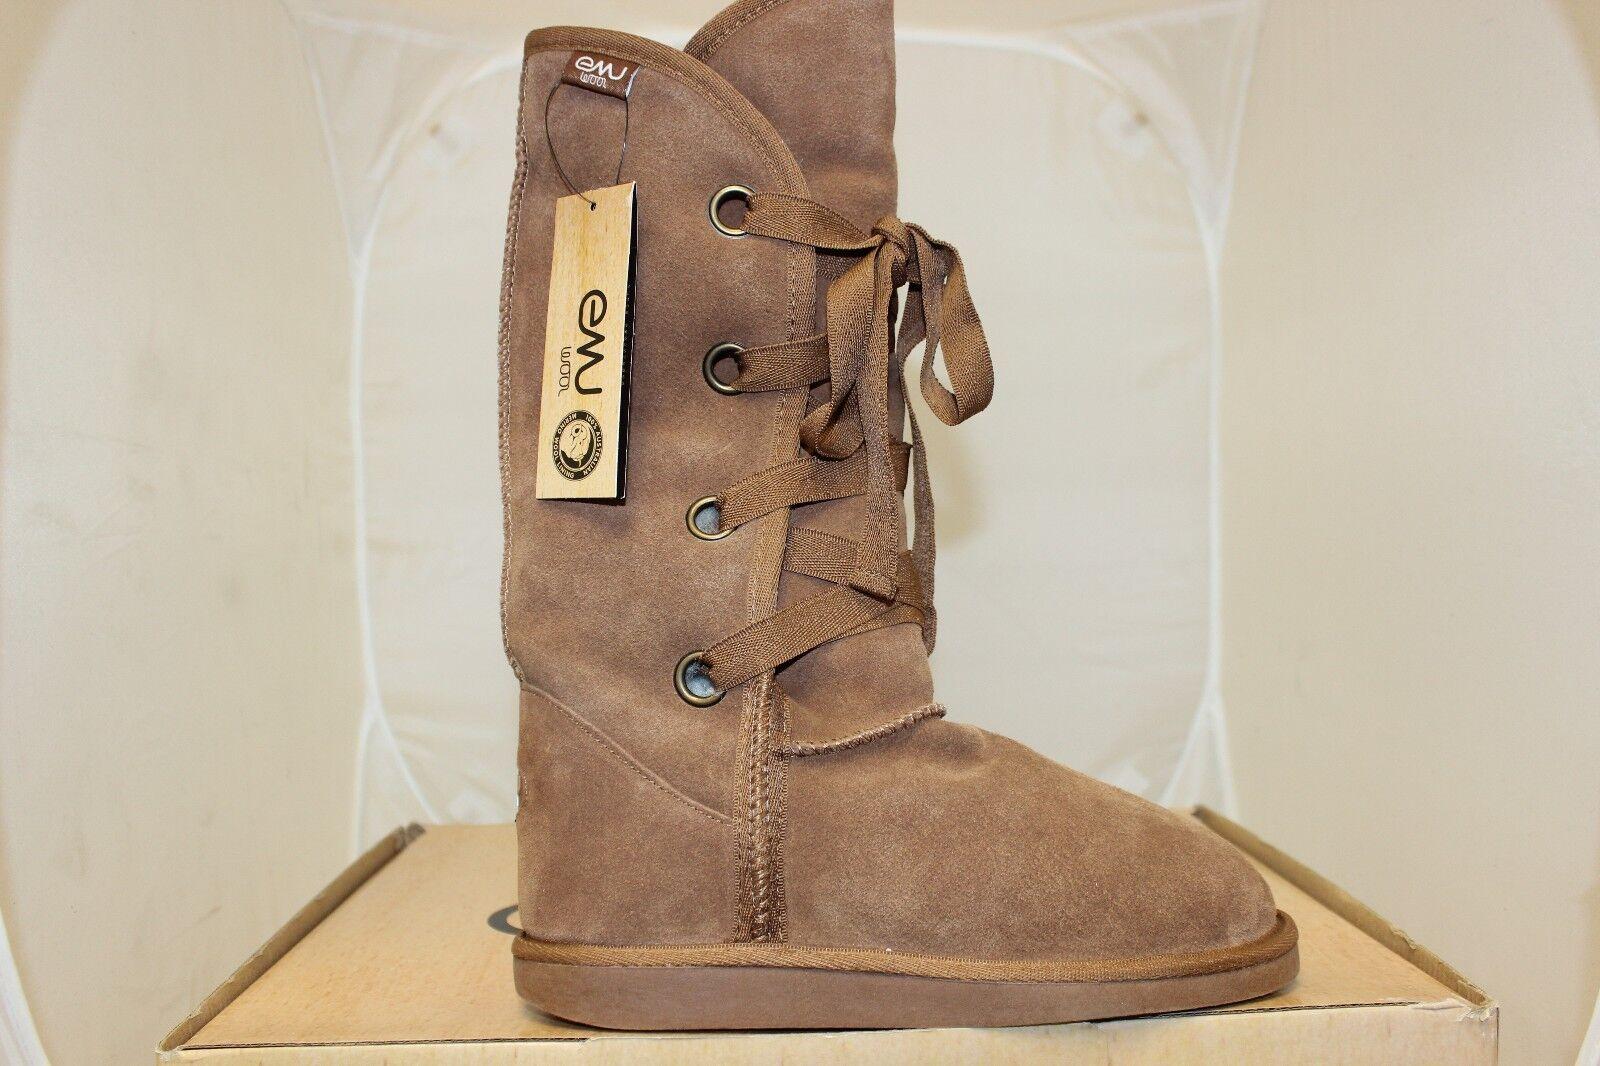 Women's Emu Shonel Boots Australian Merino Wool Winter Boots Chestnut W90092